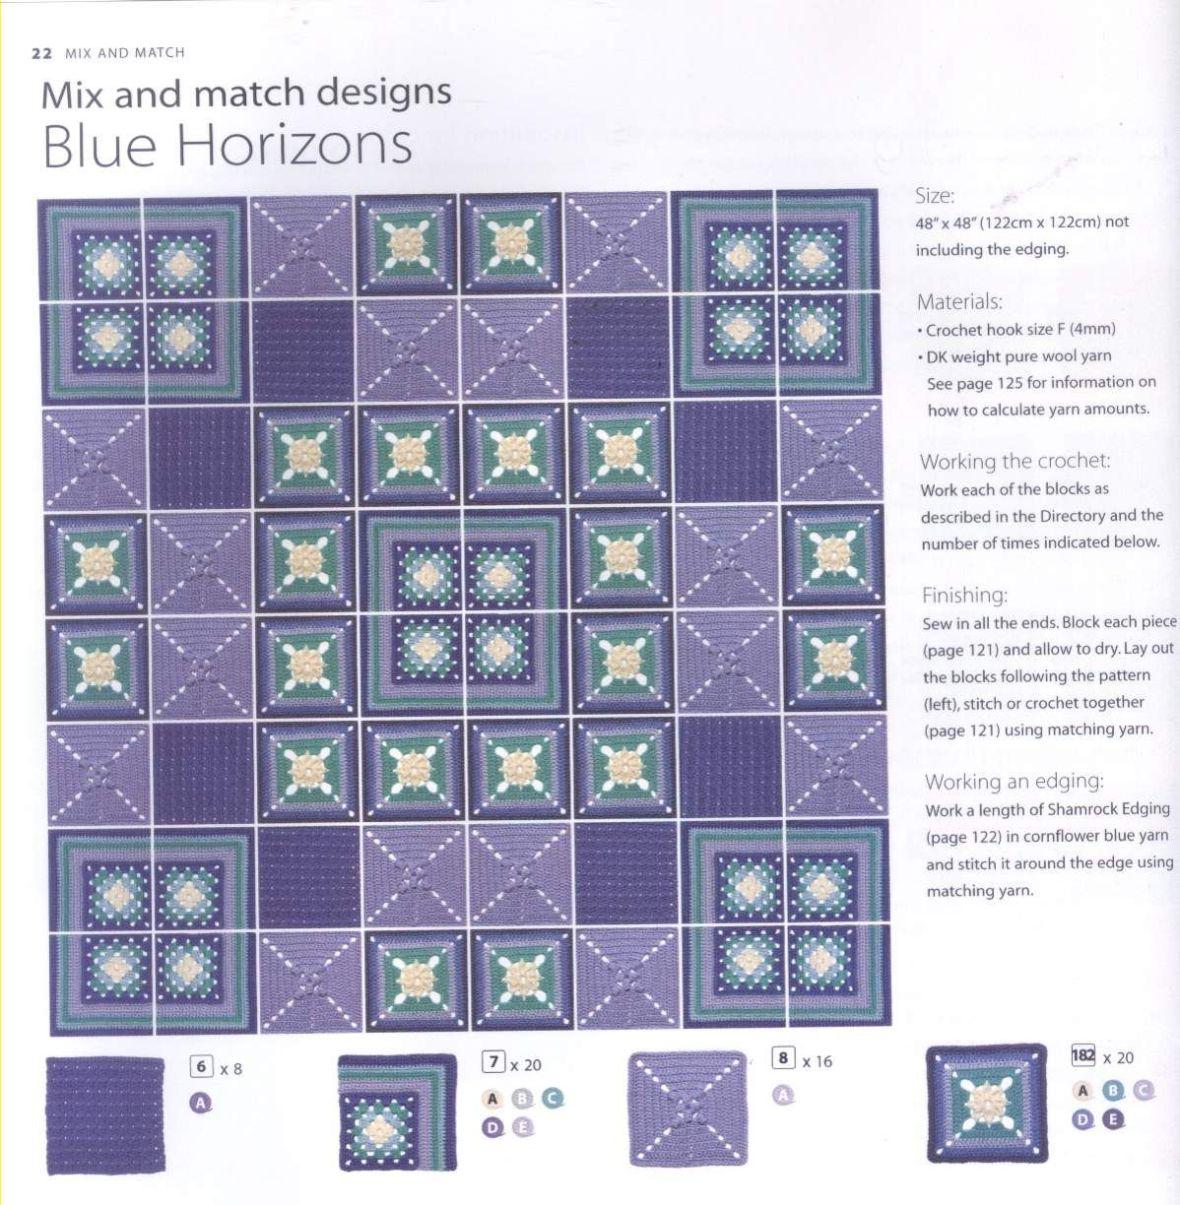 200 Crocheted Blocks for blankets, throws & Afghans 022